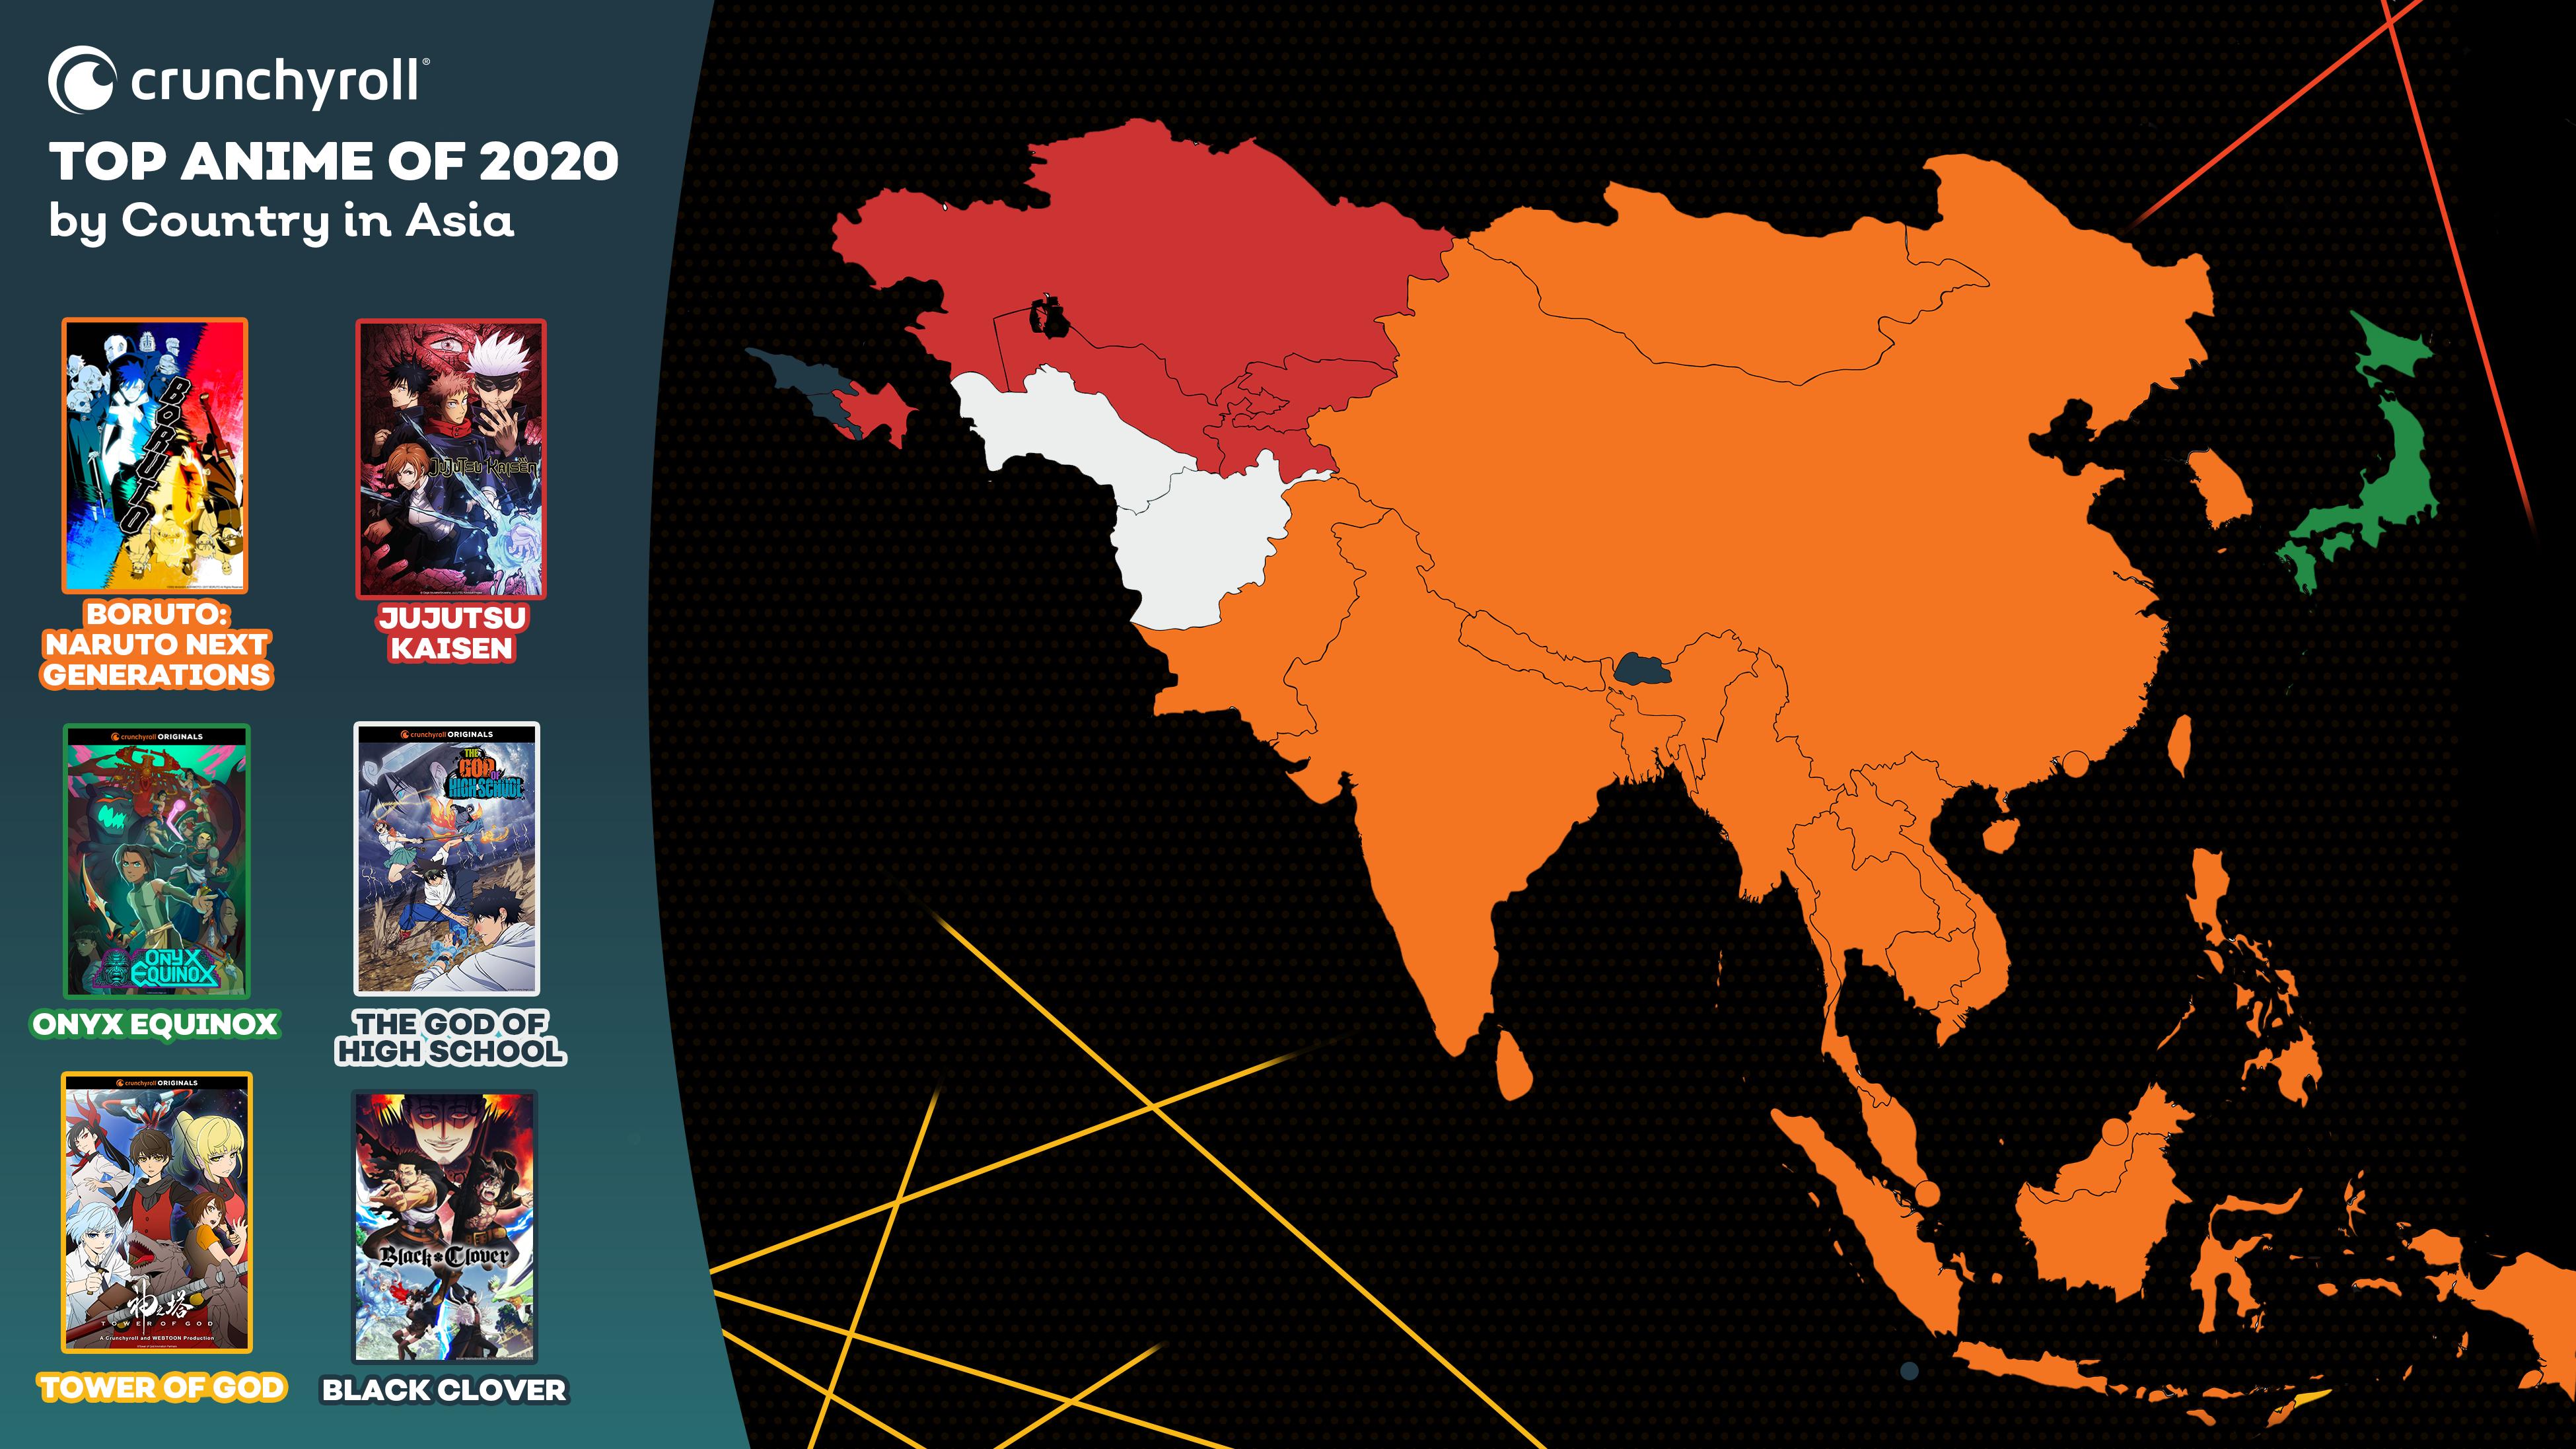 Mejor anime de 2020 por país: Asia